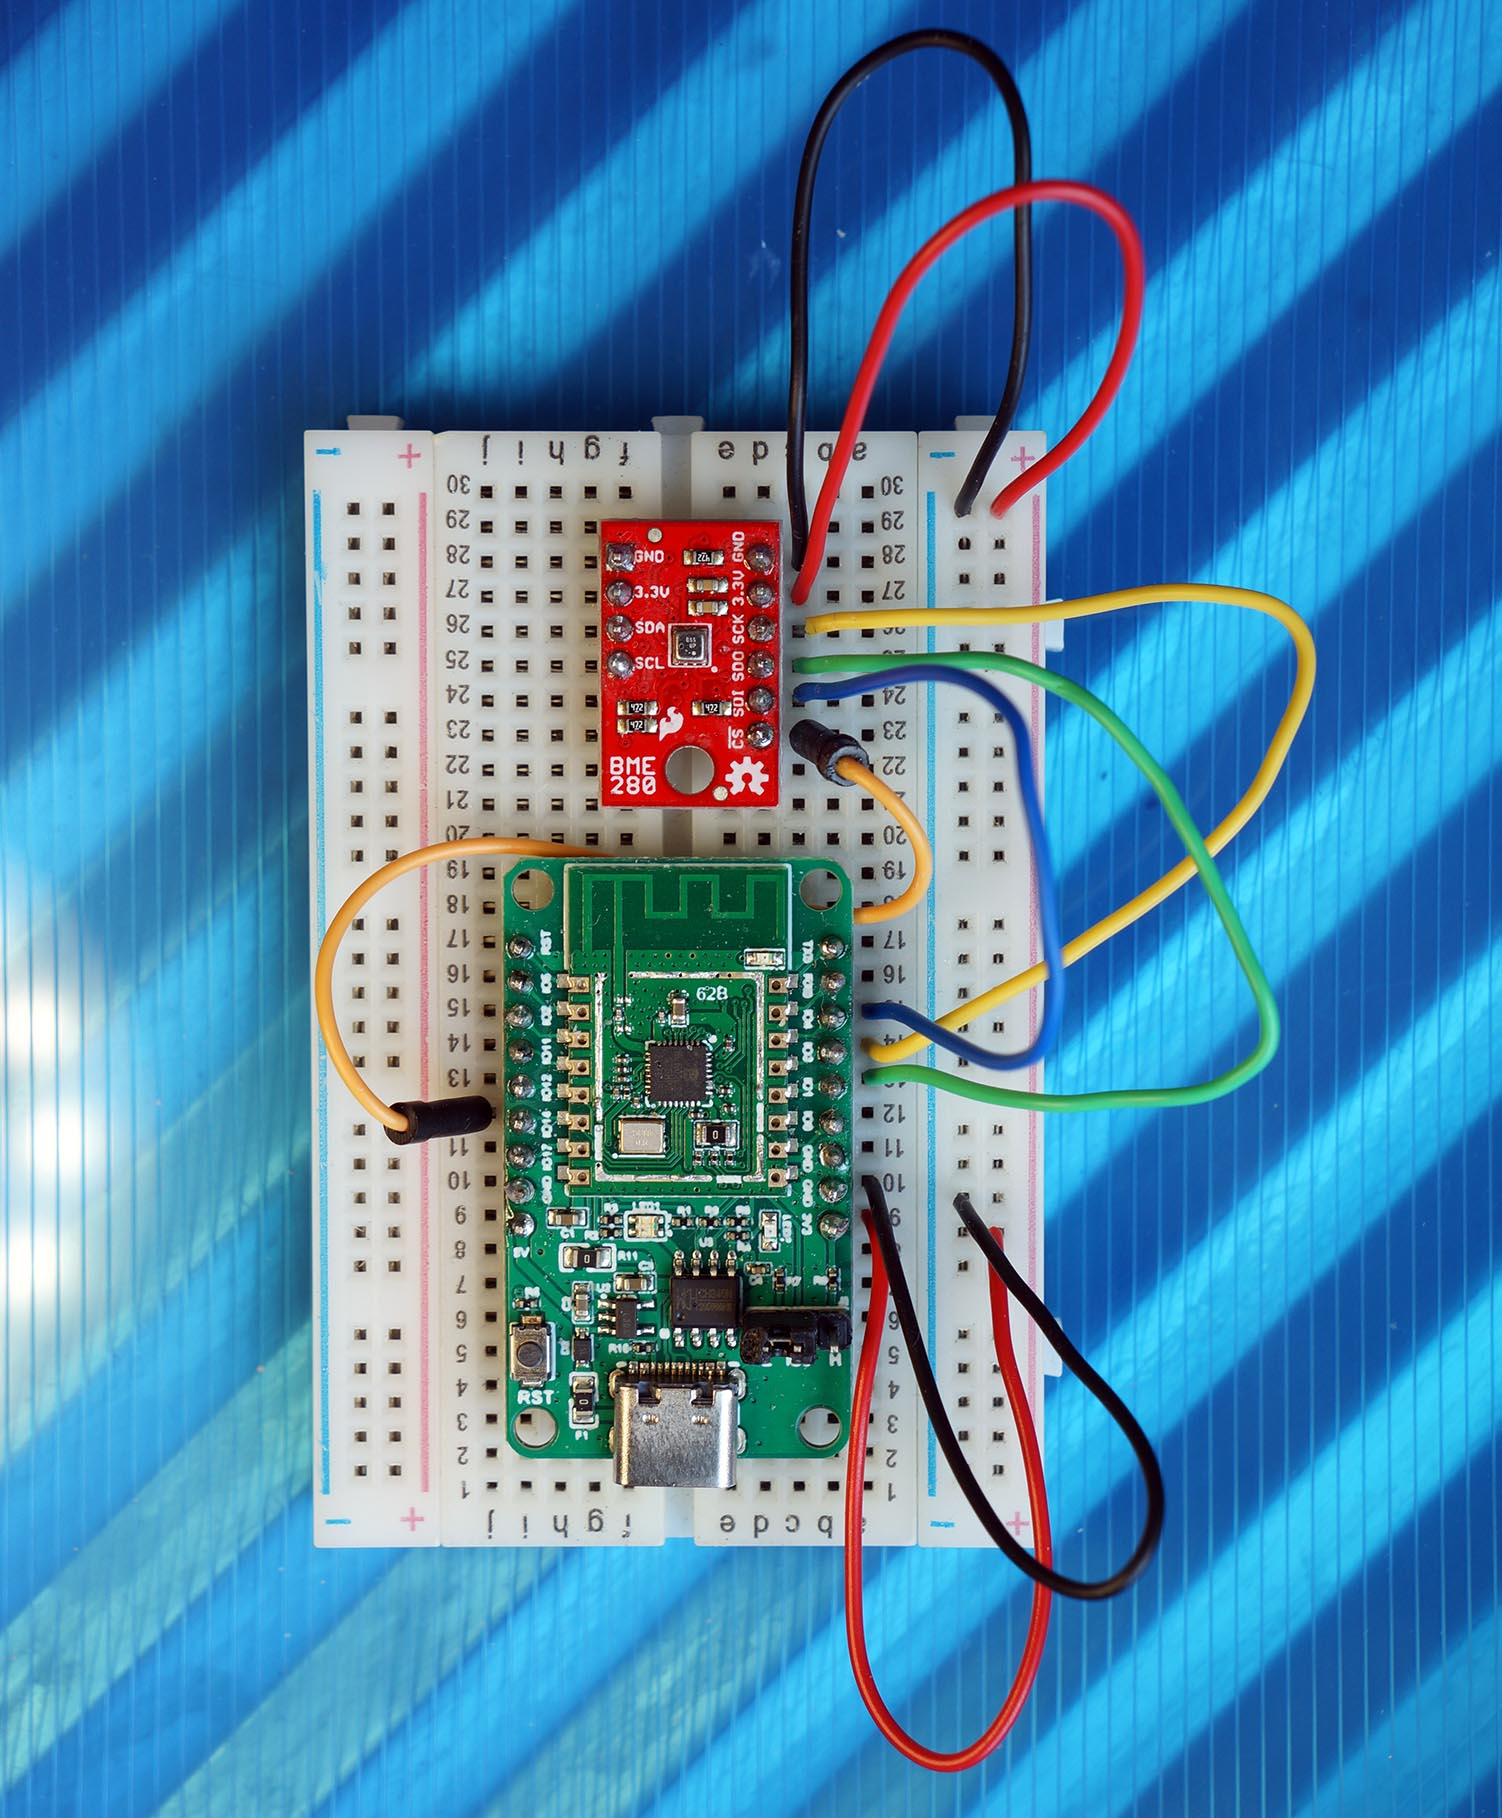 PineCone BL602 RISC-V Board connected to BME280 SPI Sensor